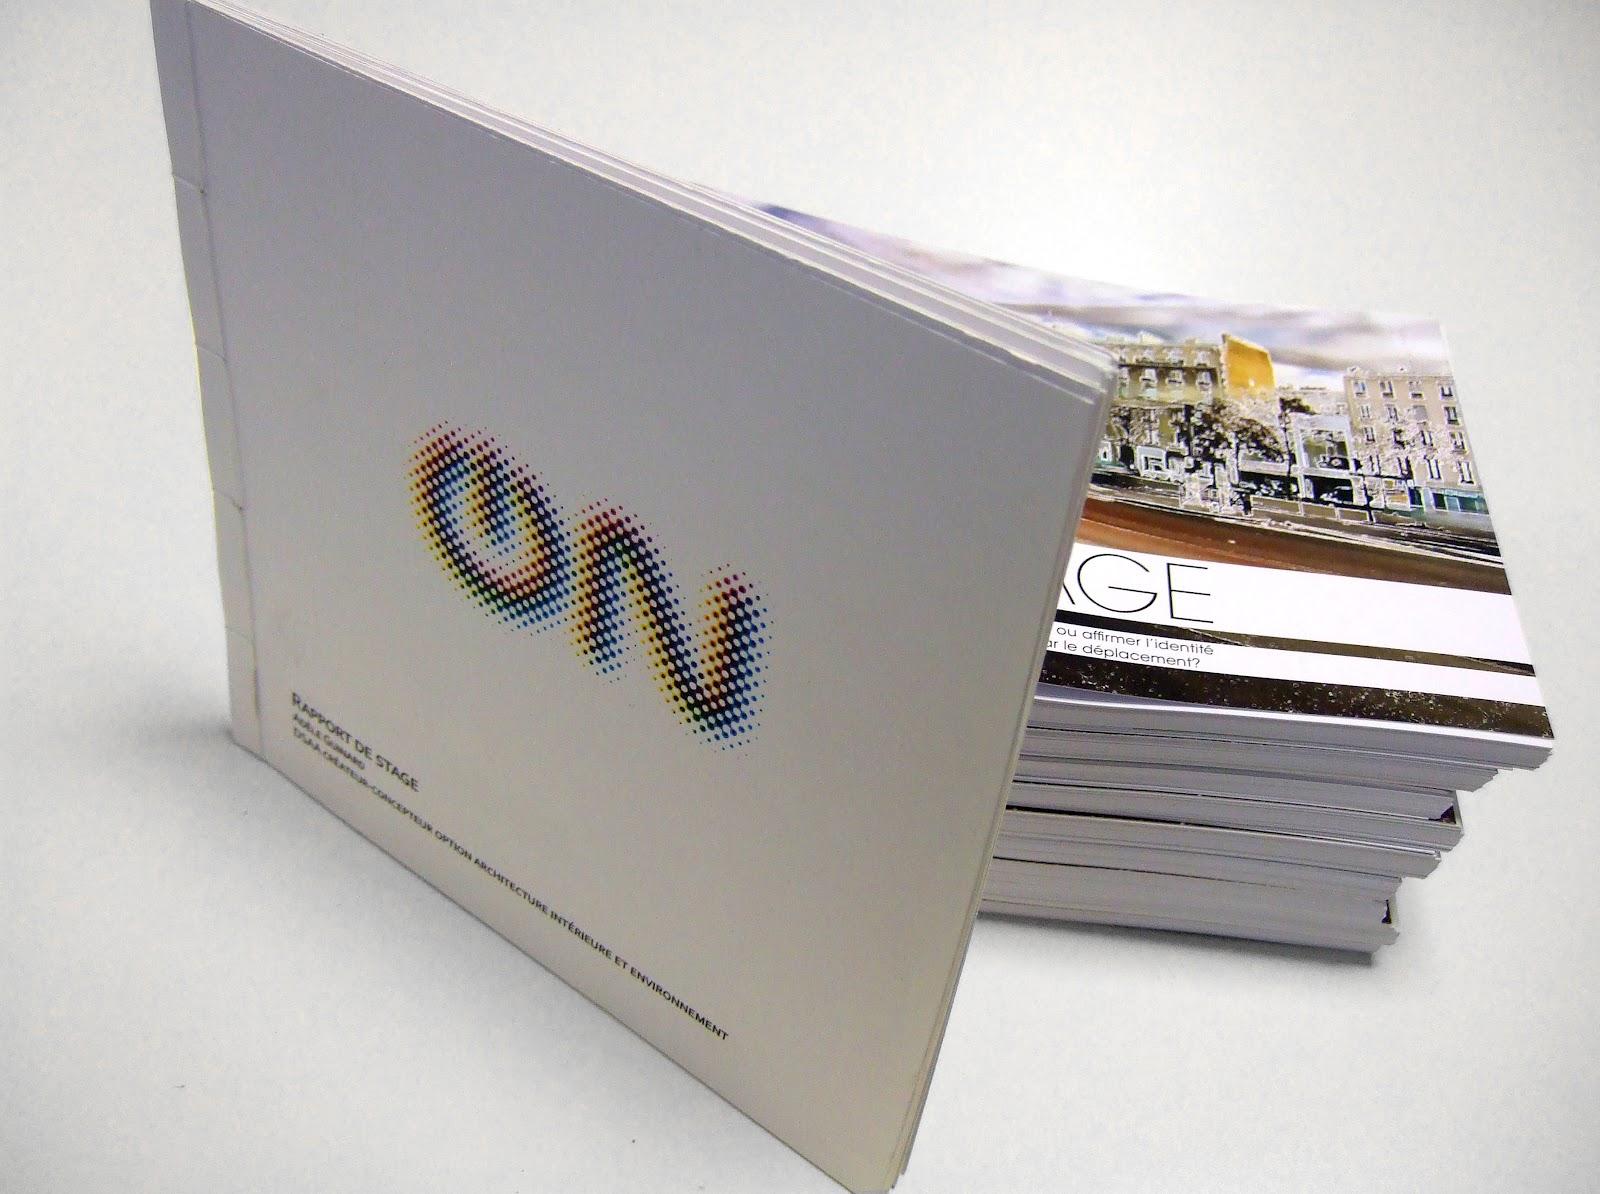 rapport de stage r u00e9alis u00e9 chez l u0026 39  agence de conception